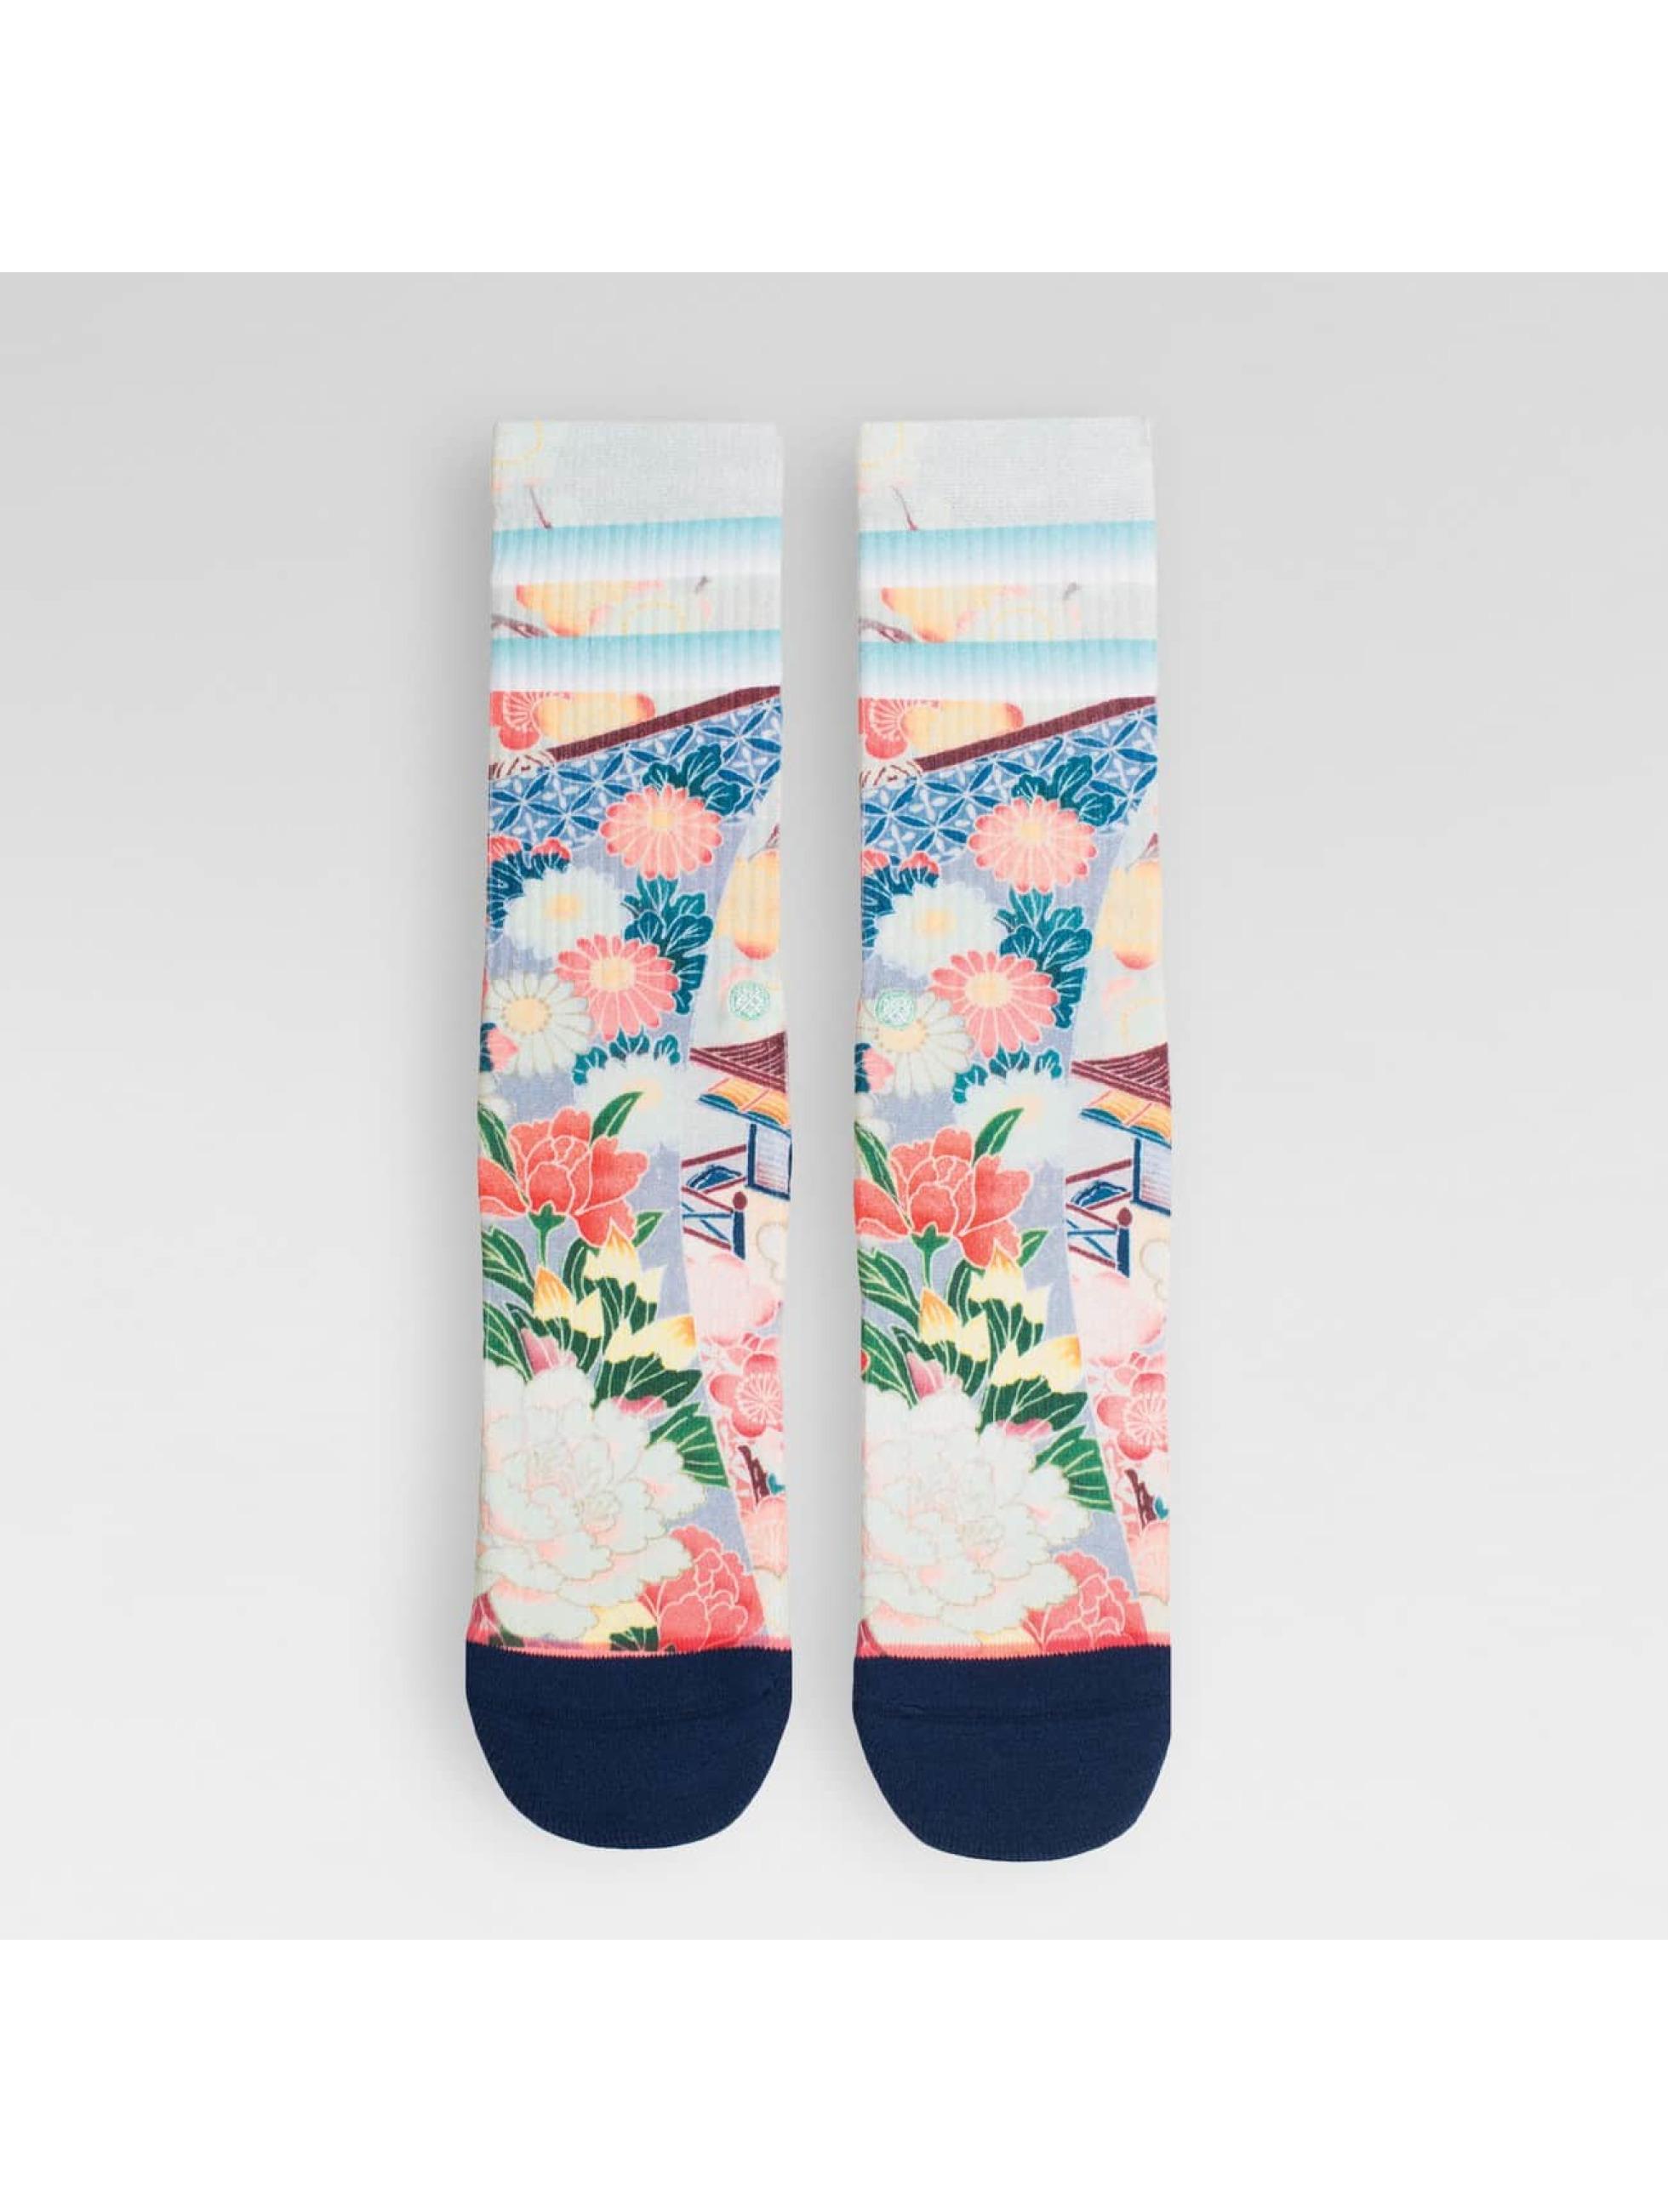 Stance Socks Chinsuko colored